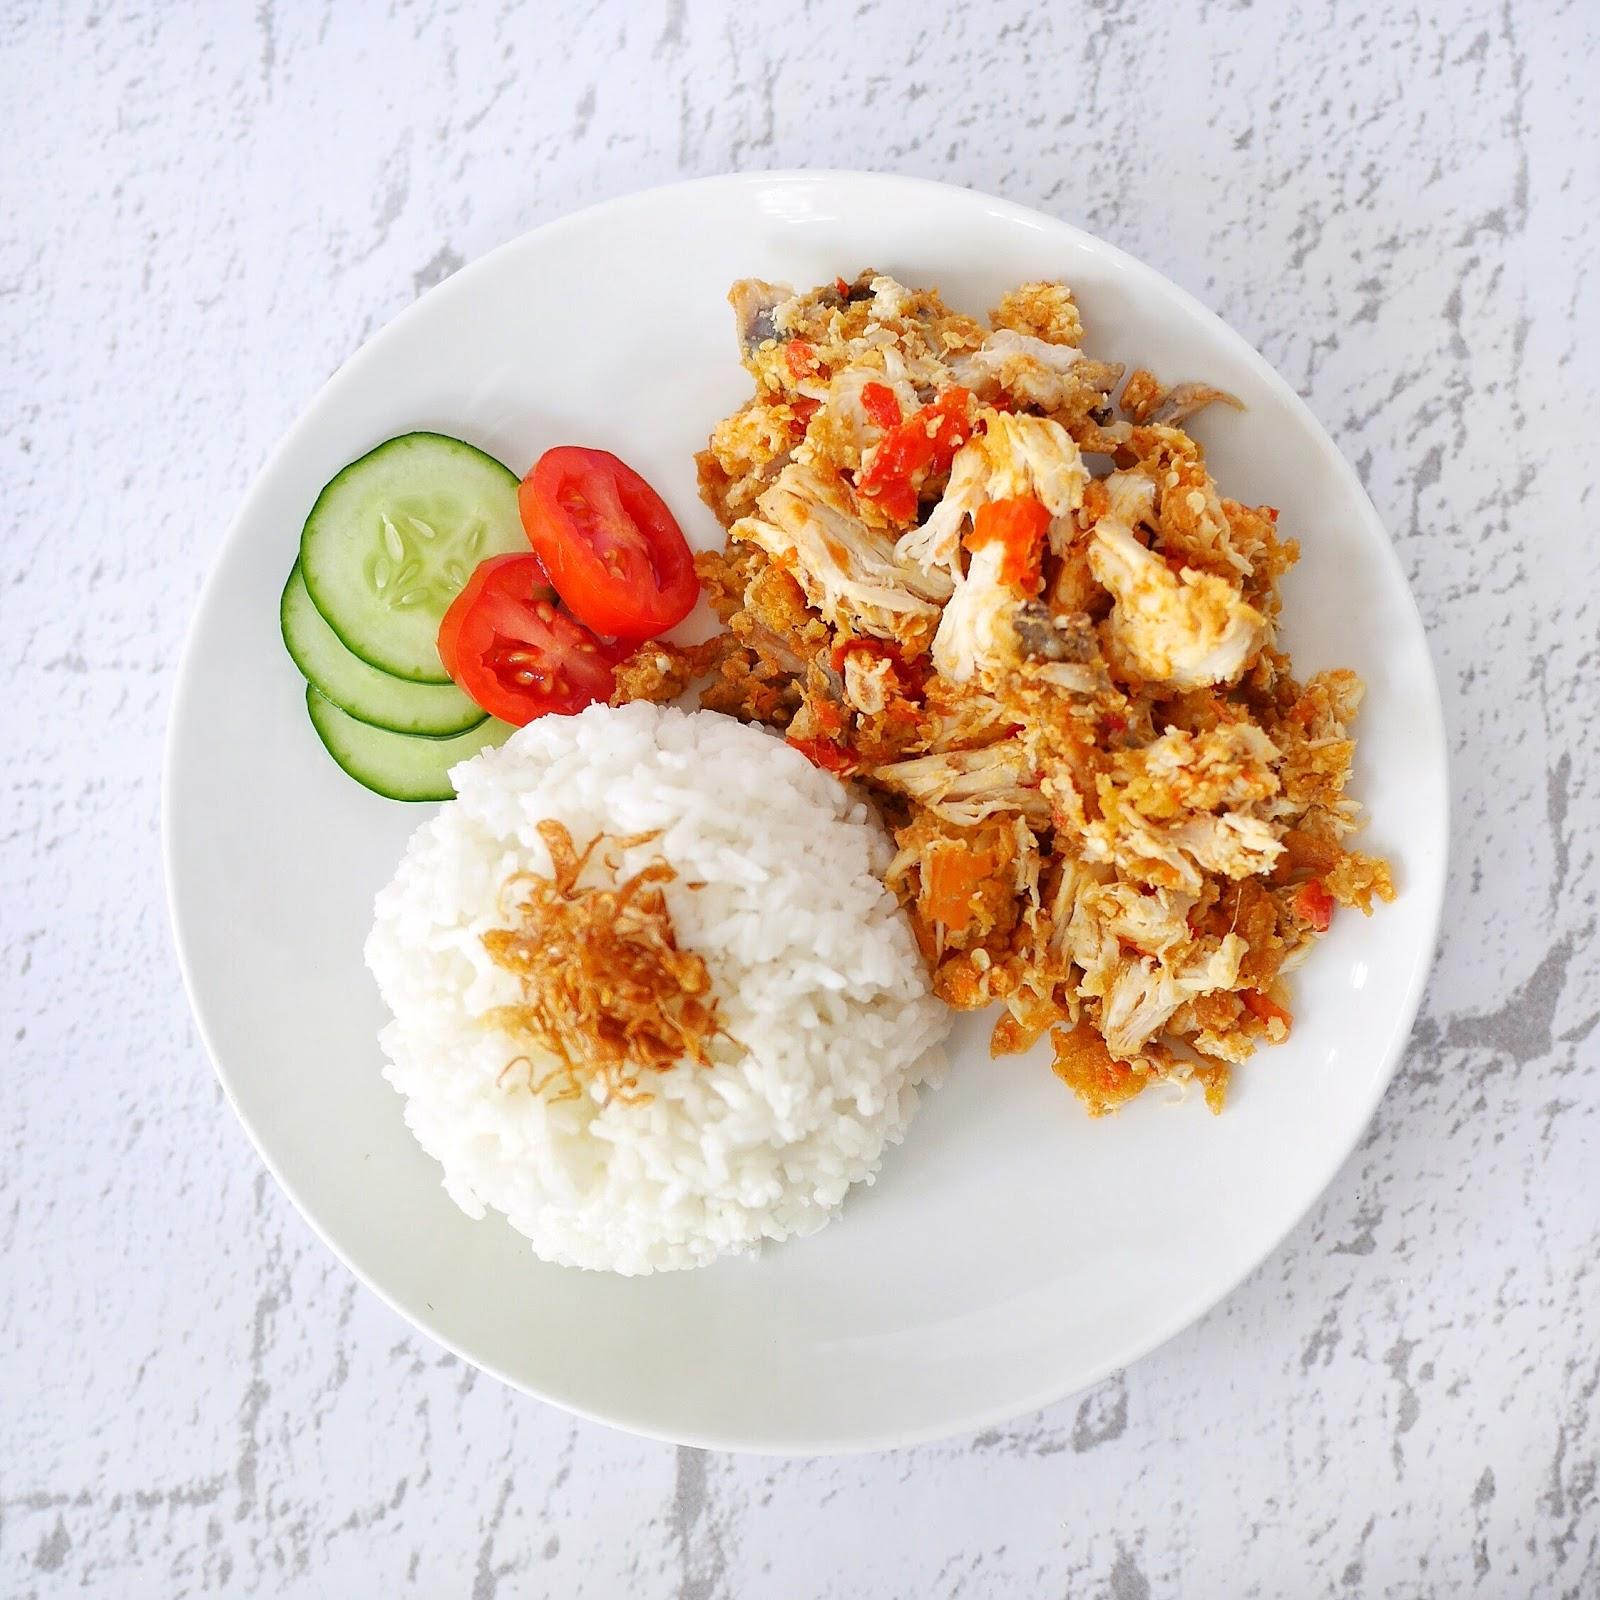 Resep: Ayam Geprek a'la Jogja | HeyTheresia - Indonesian Food & Travel Blogger